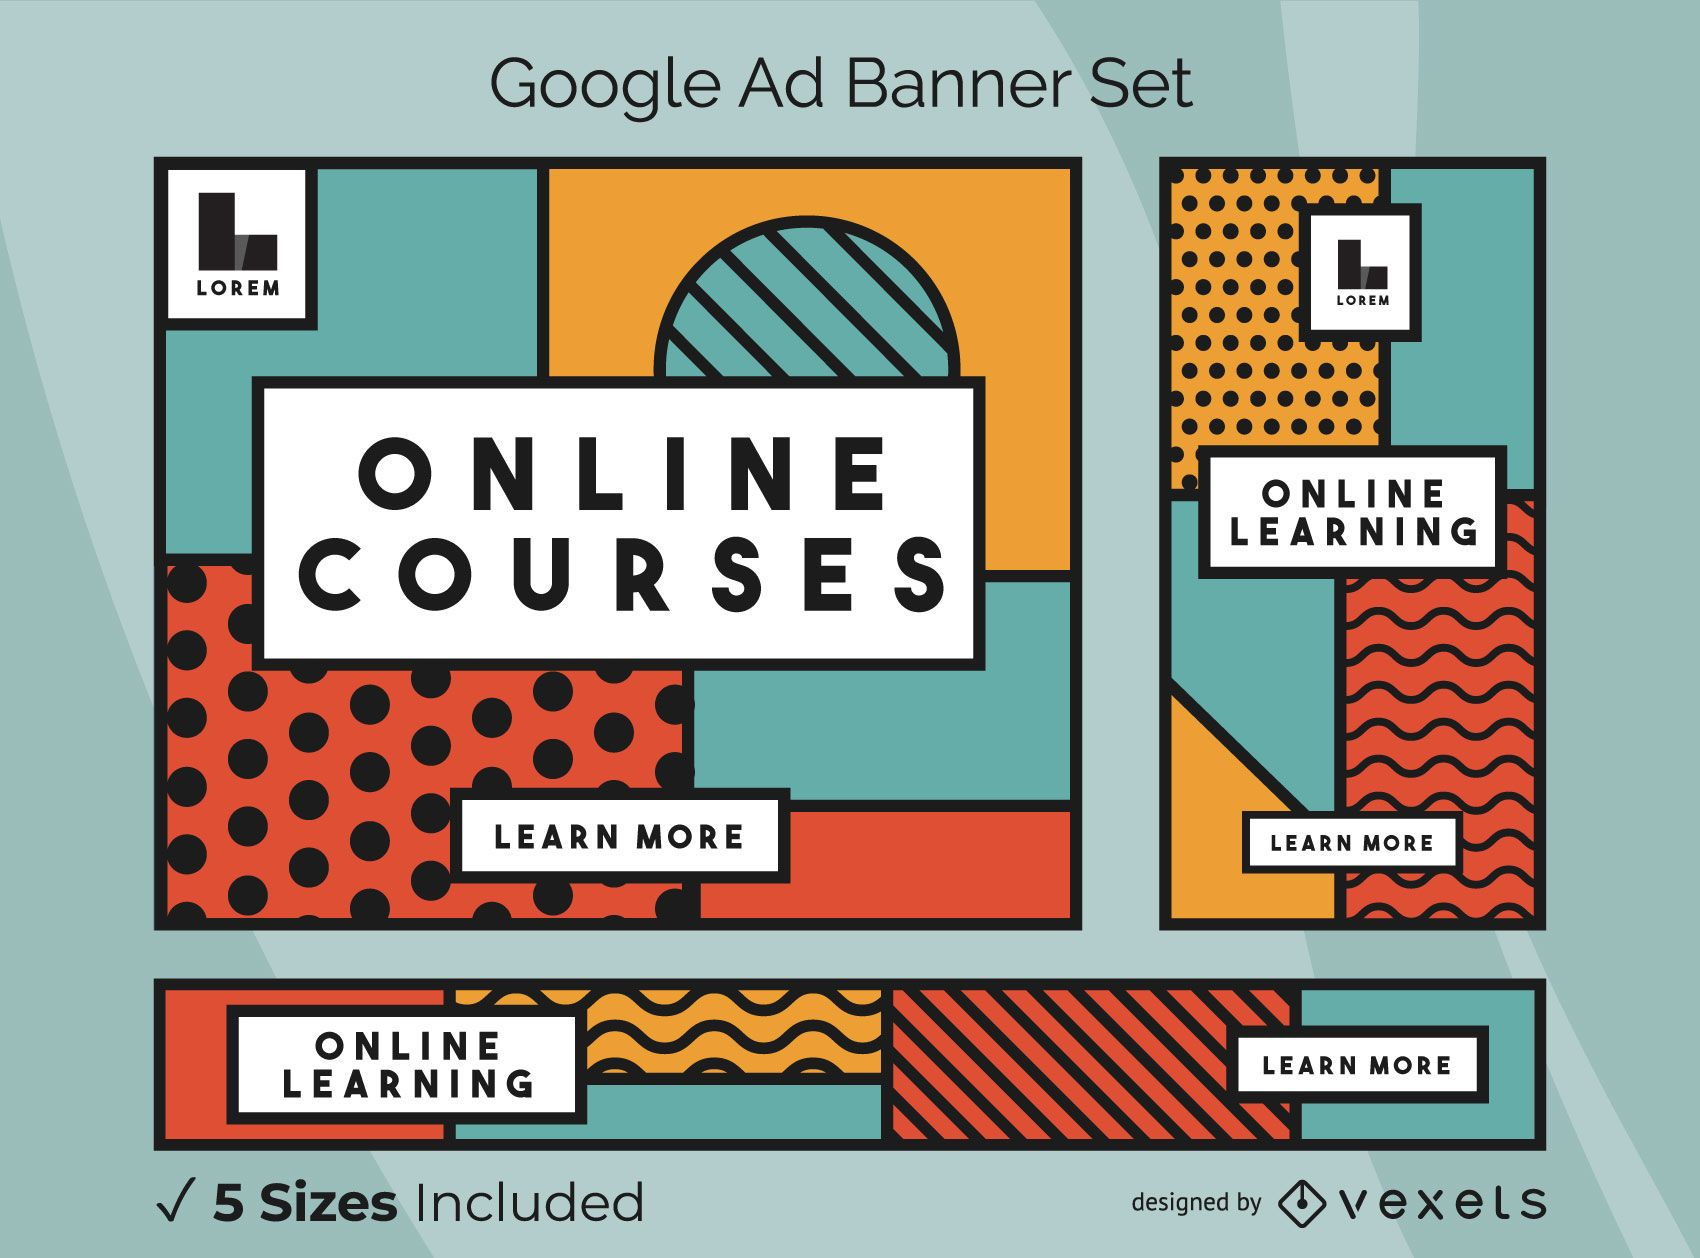 Pacote de banners do Google Ads de cursos online